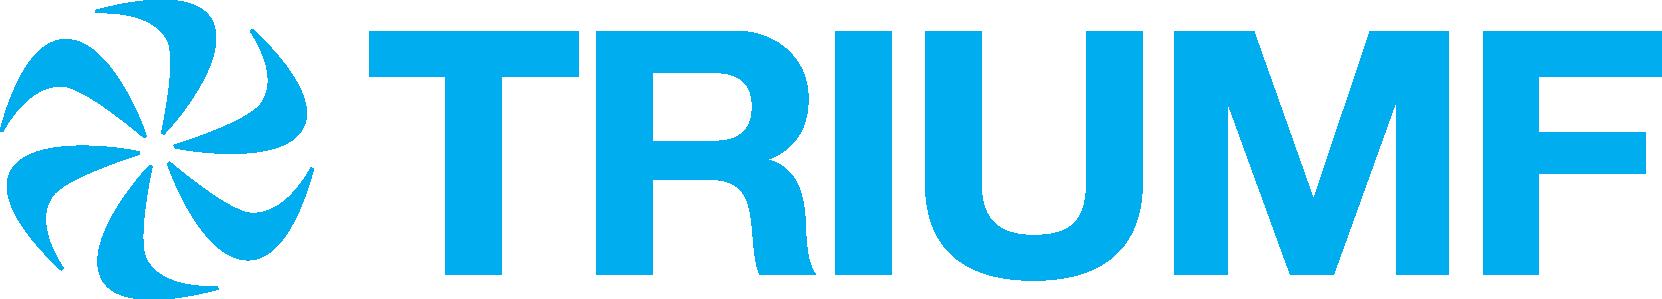 Logo_Positive_Blue.png